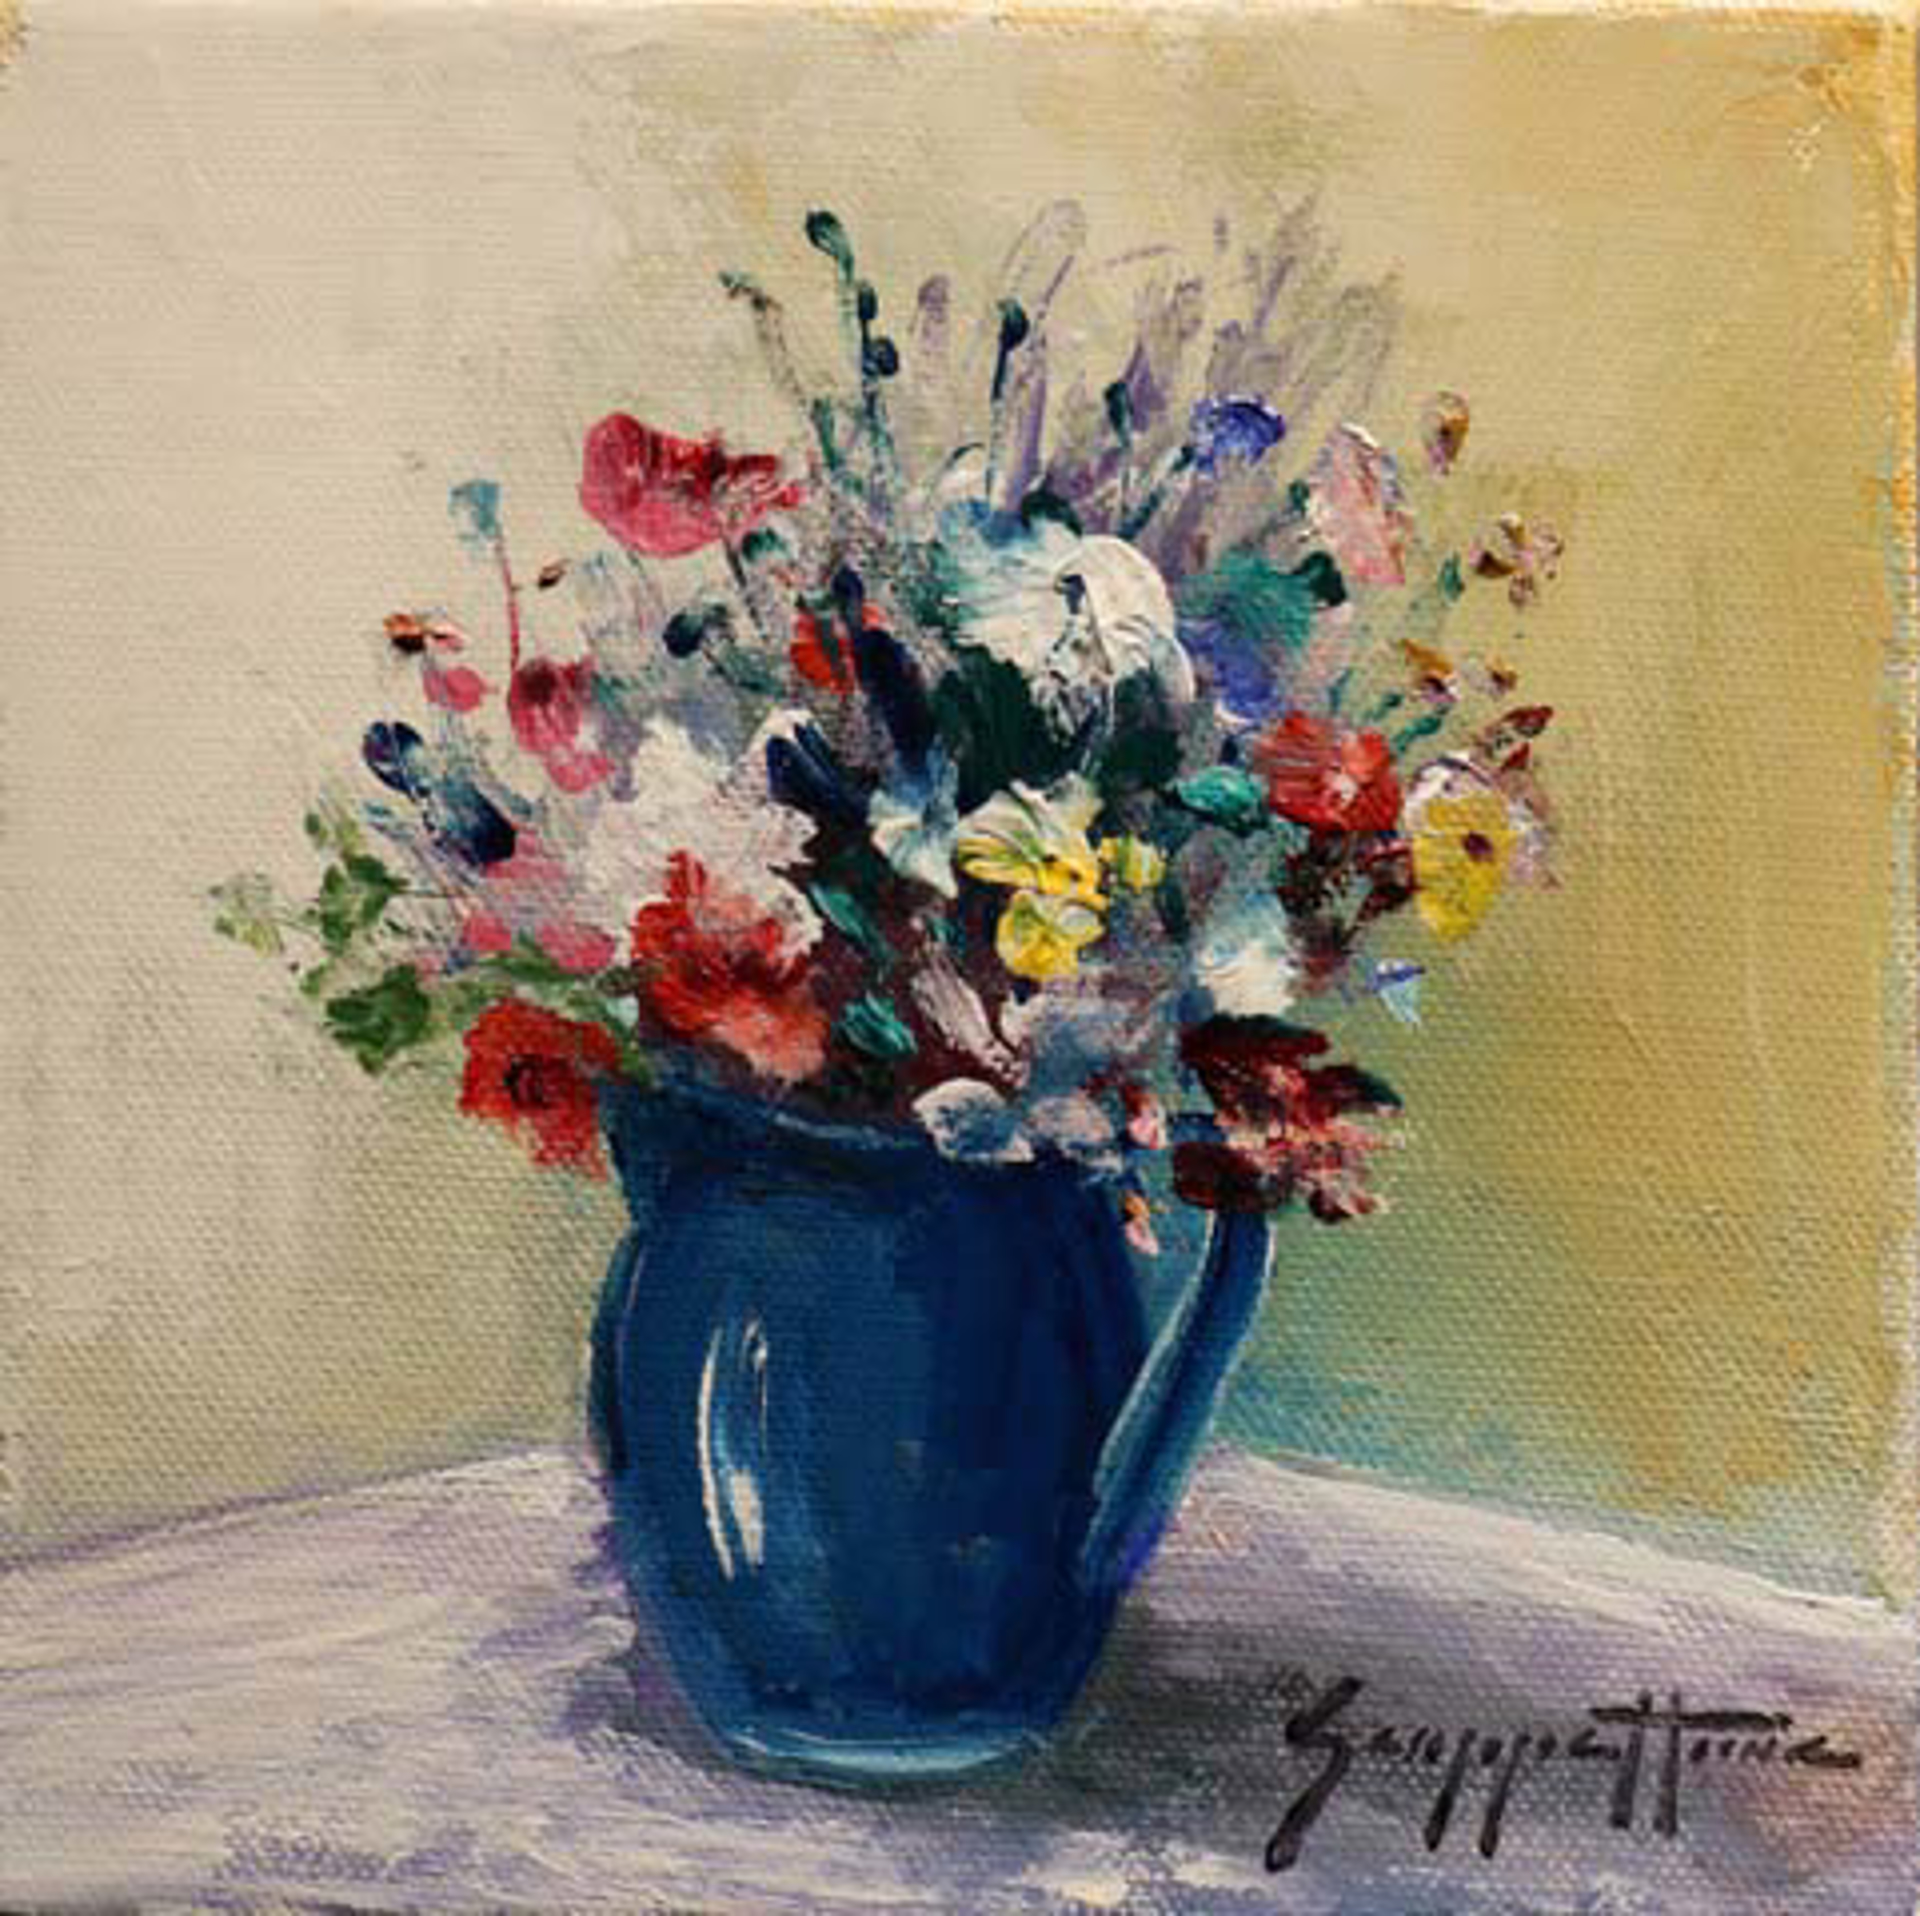 A Summer Bouquet by James Scoppettone